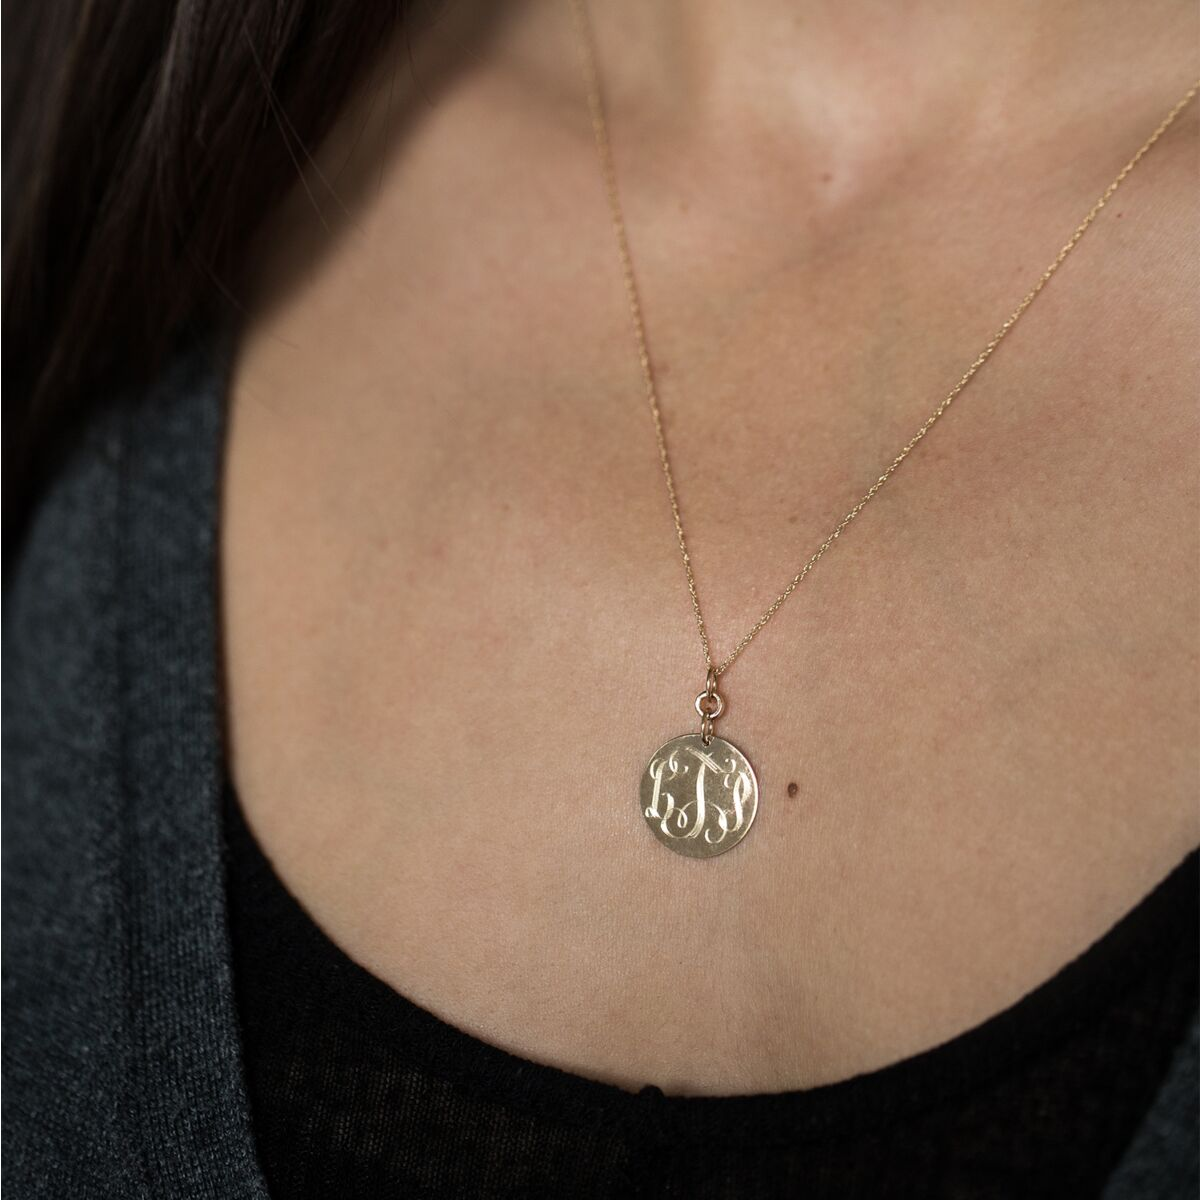 Monogram Necklace image